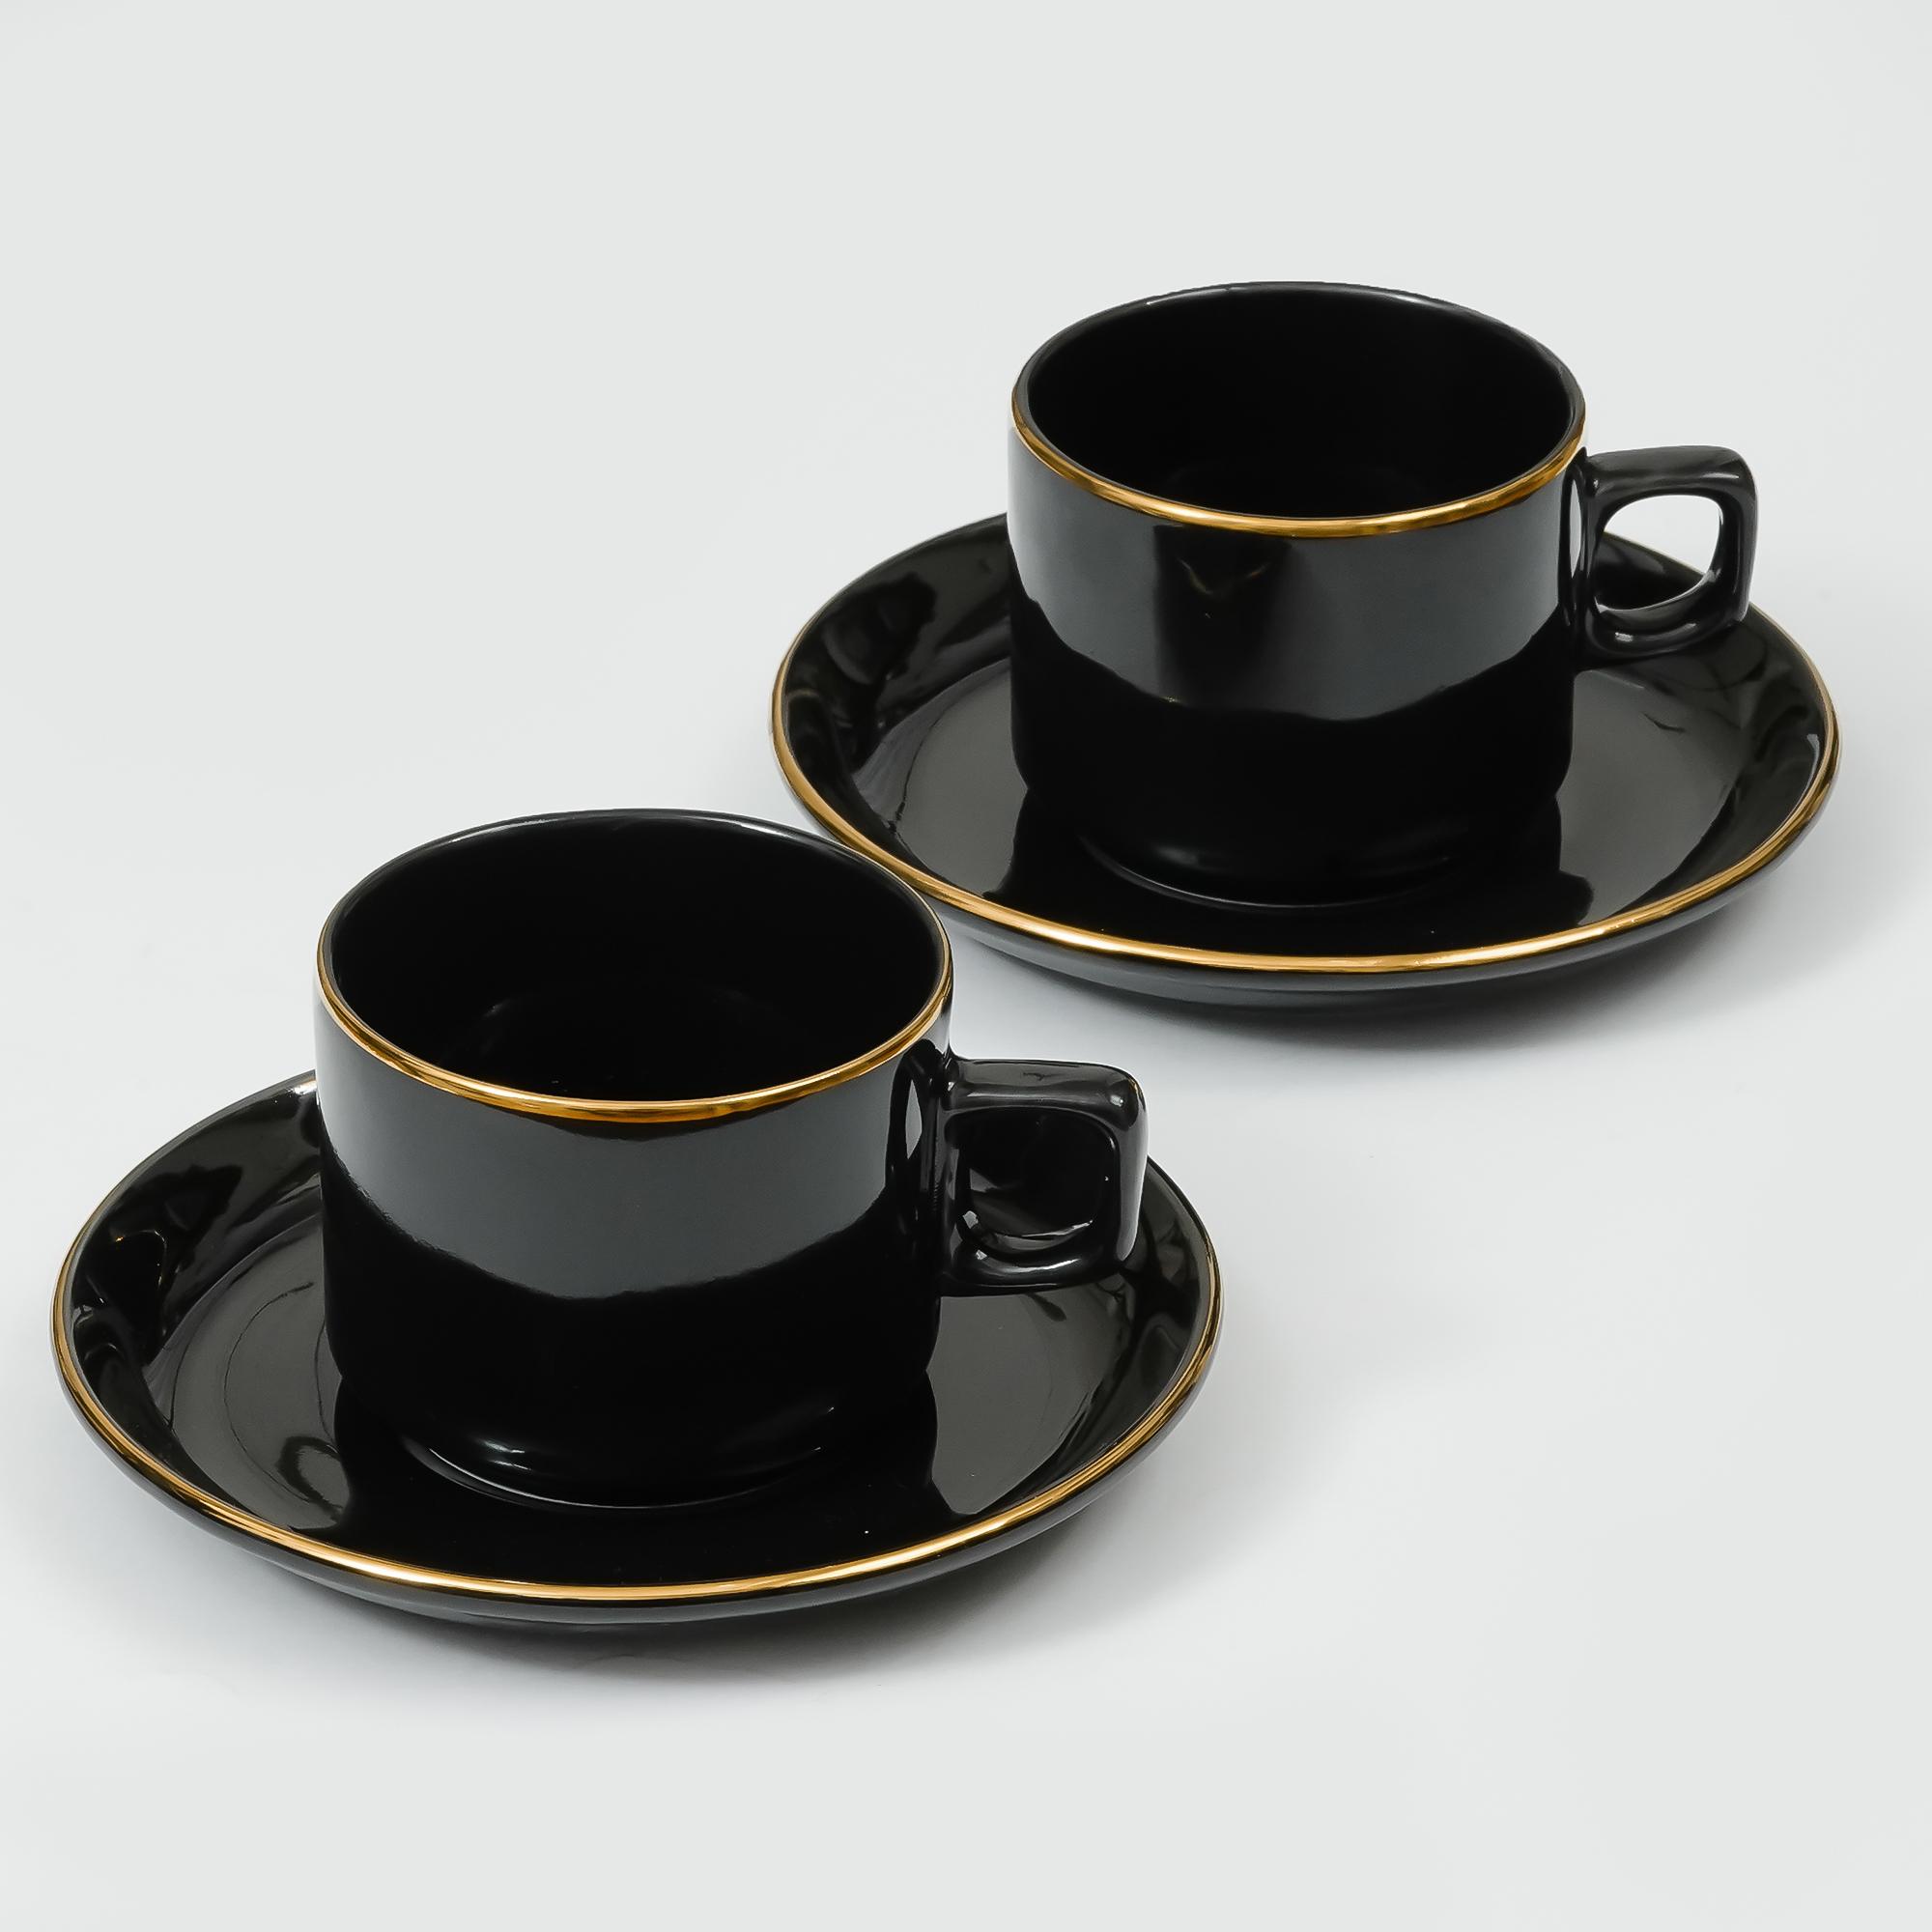 Indian Ceramic Bone China Black Gold Plated Tea 4 Cup &  4 Saucers - 200 ML